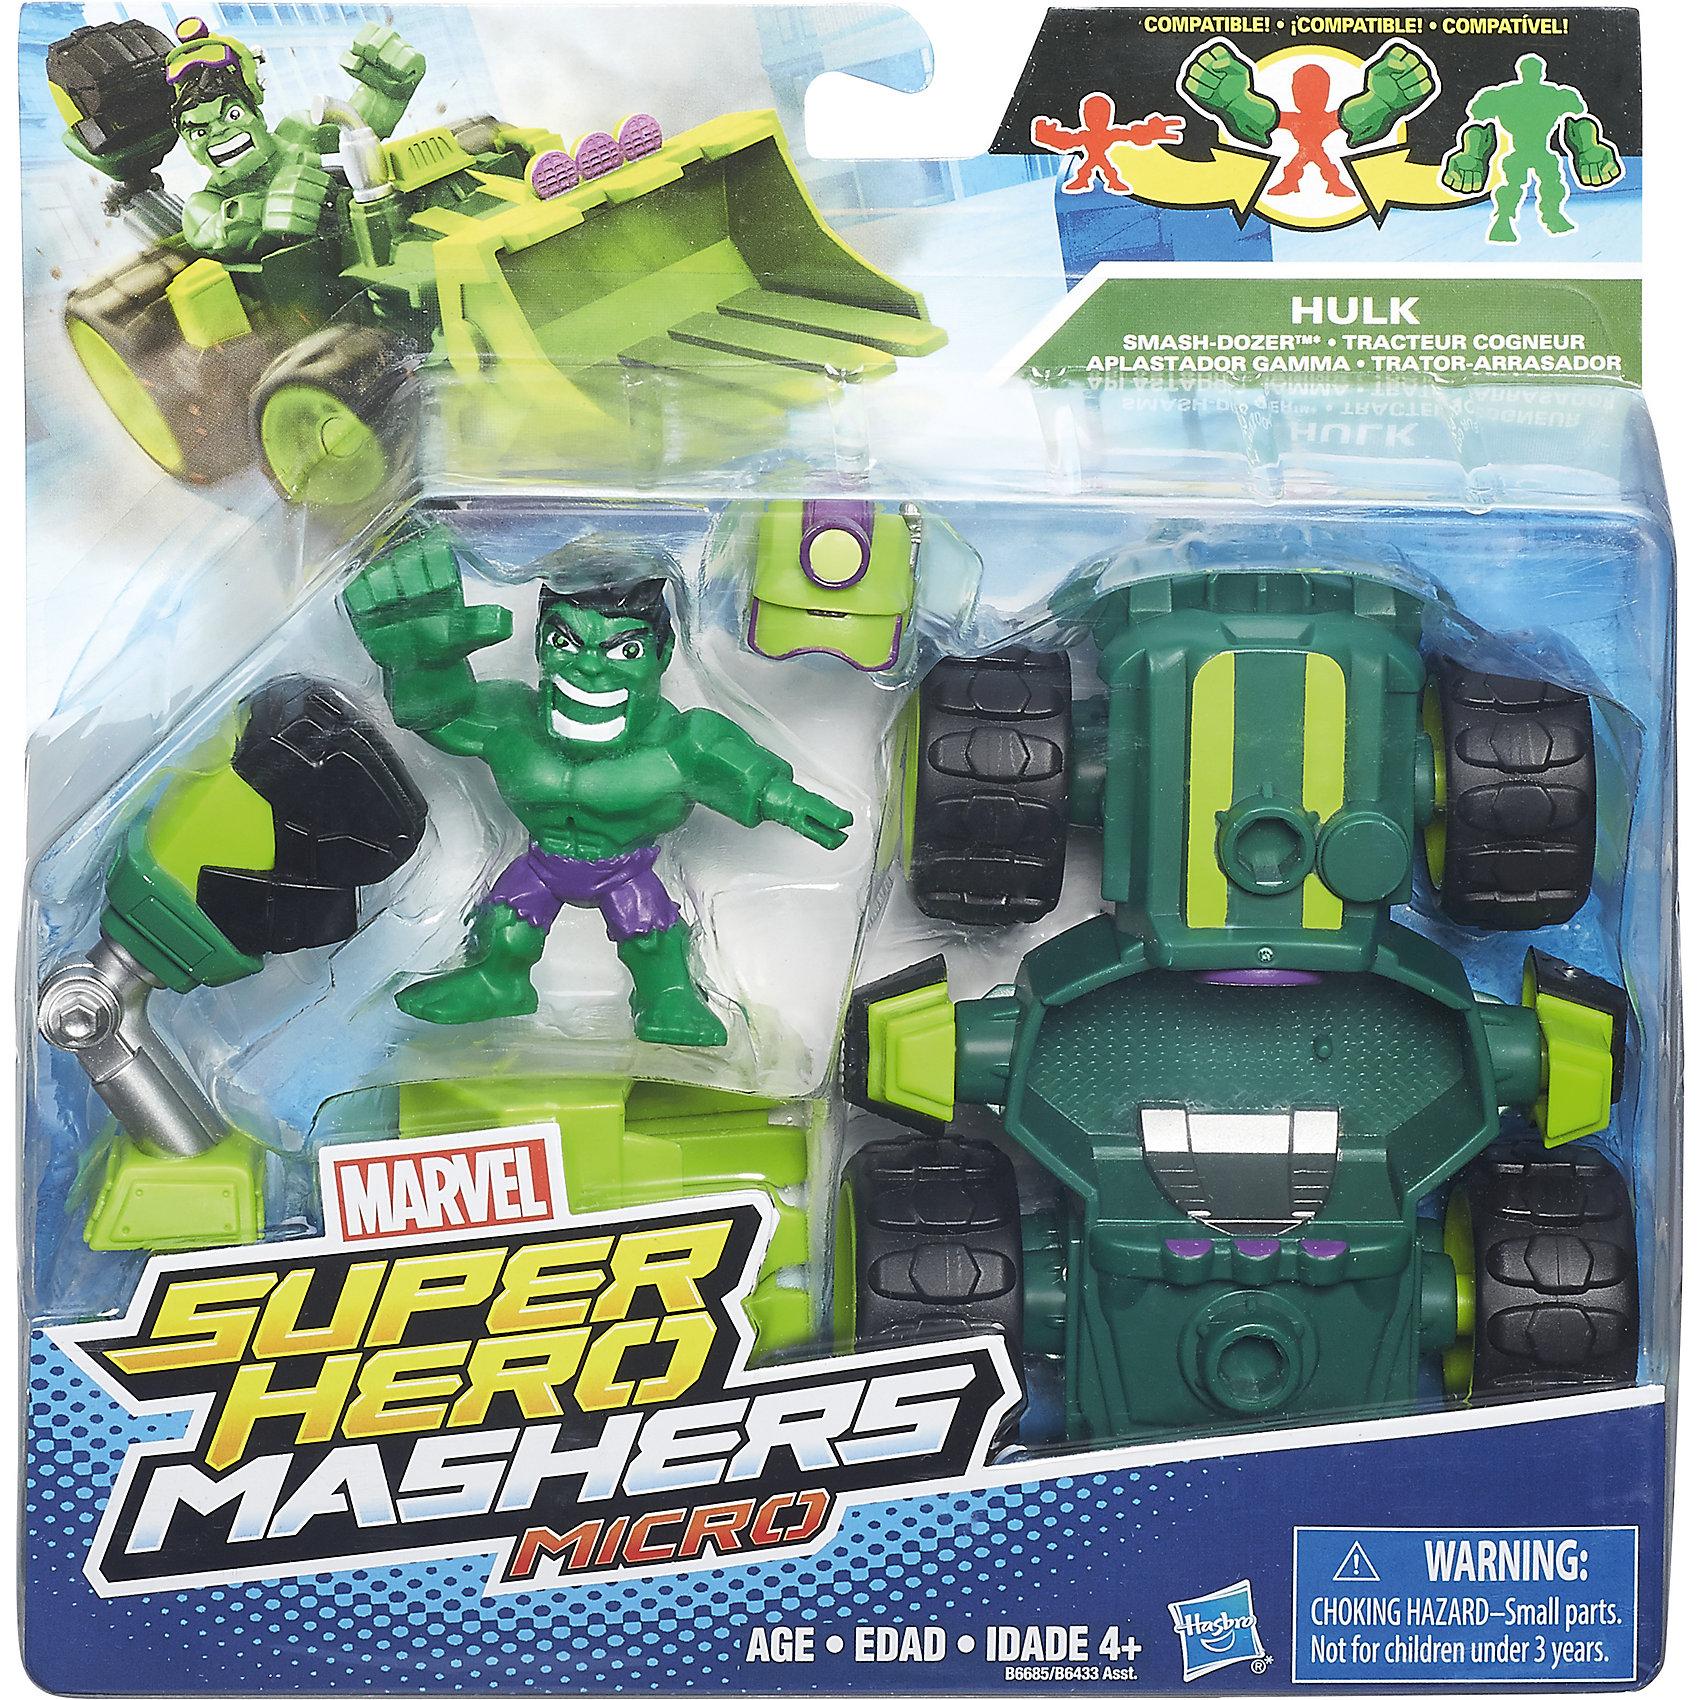 Hasbro Набор Микро-Фигурка + Машина Марвел, HEROMASHERS фигурки игрушки hasbro набор микро фигурок марвел